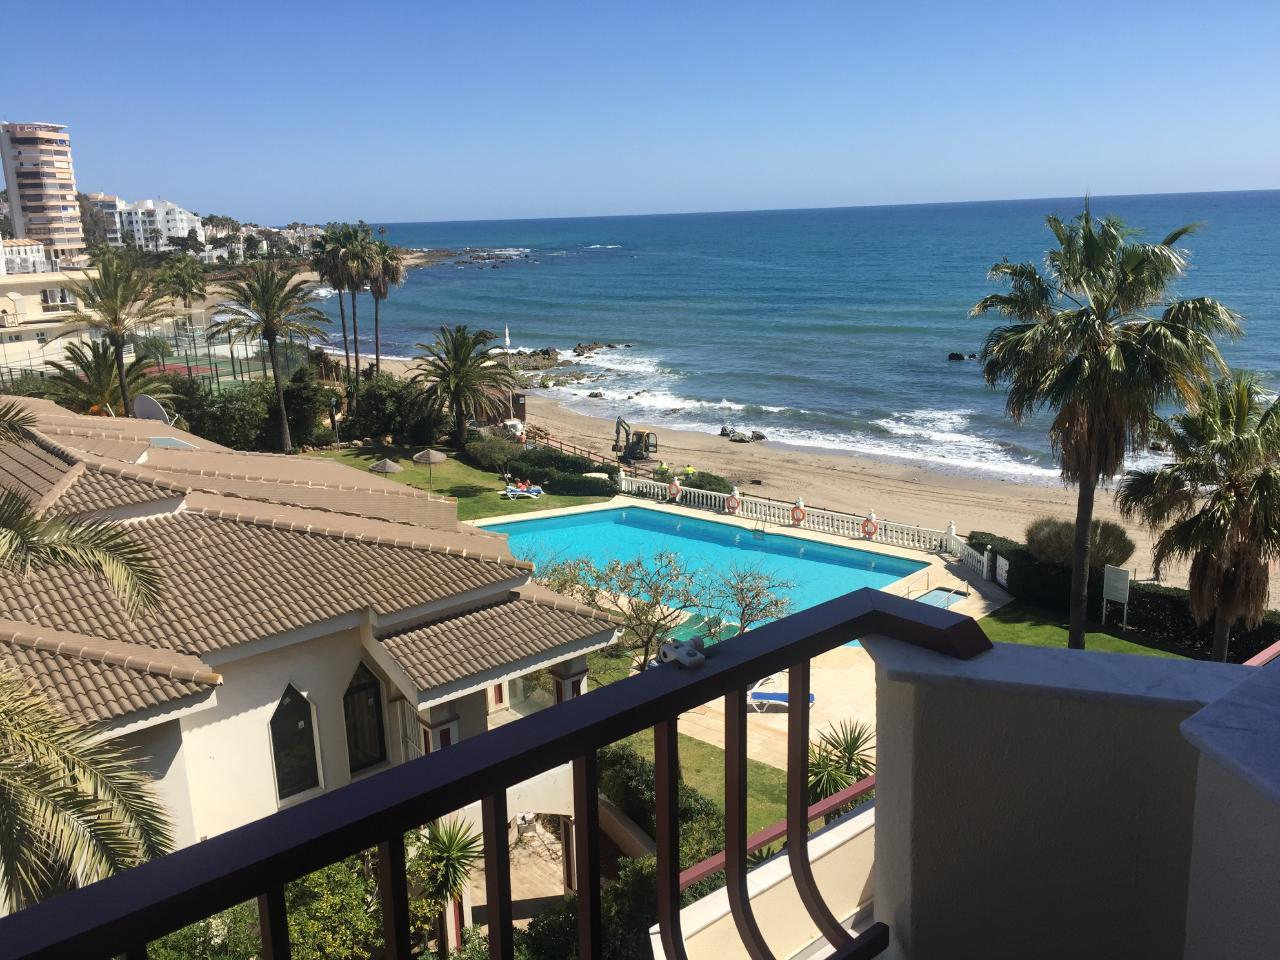 Ferienwohnung Lubina del Sol 1 3 mit Meerblick in Cala de Mijas nur 50 Meter vom Strand